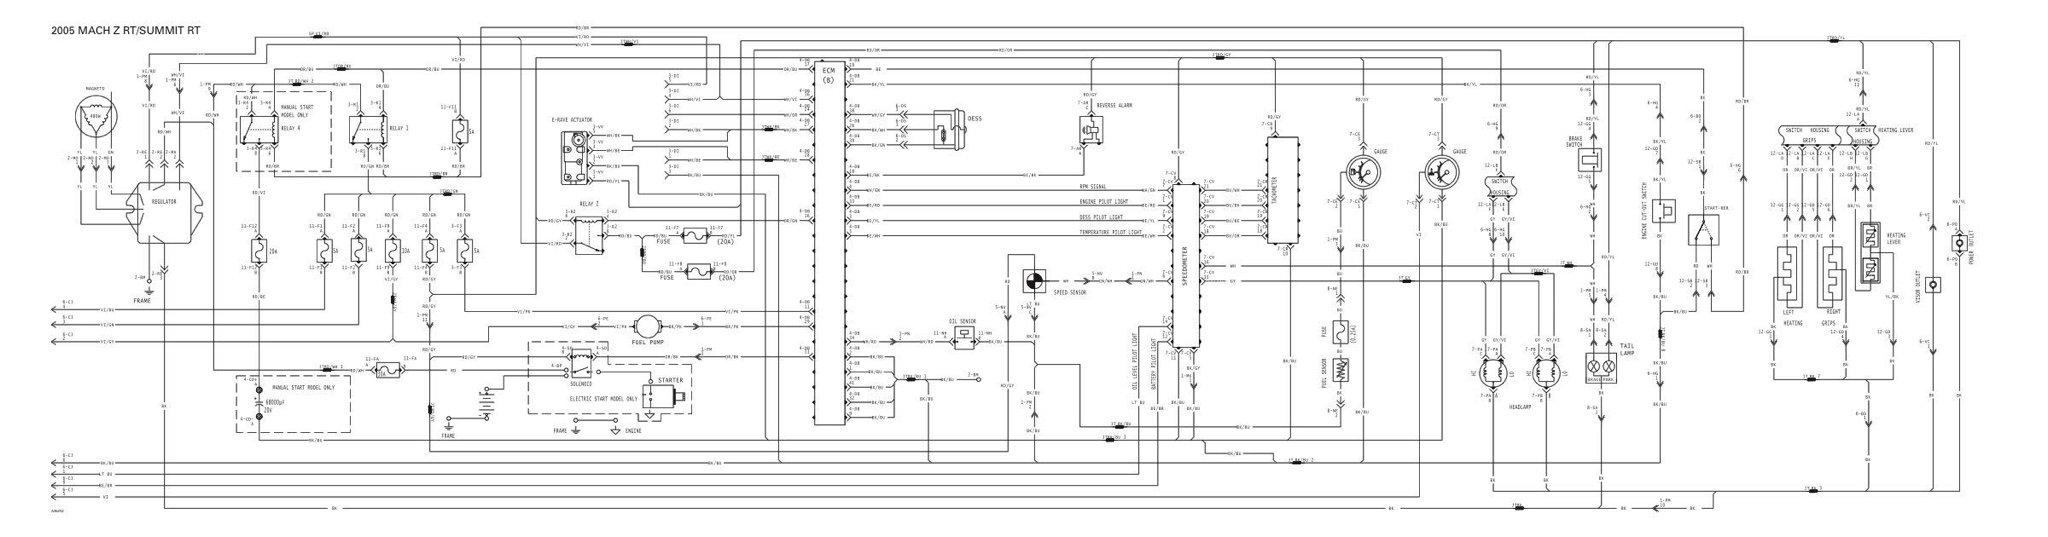 Wiring Diagram 1999 670 Skidoo